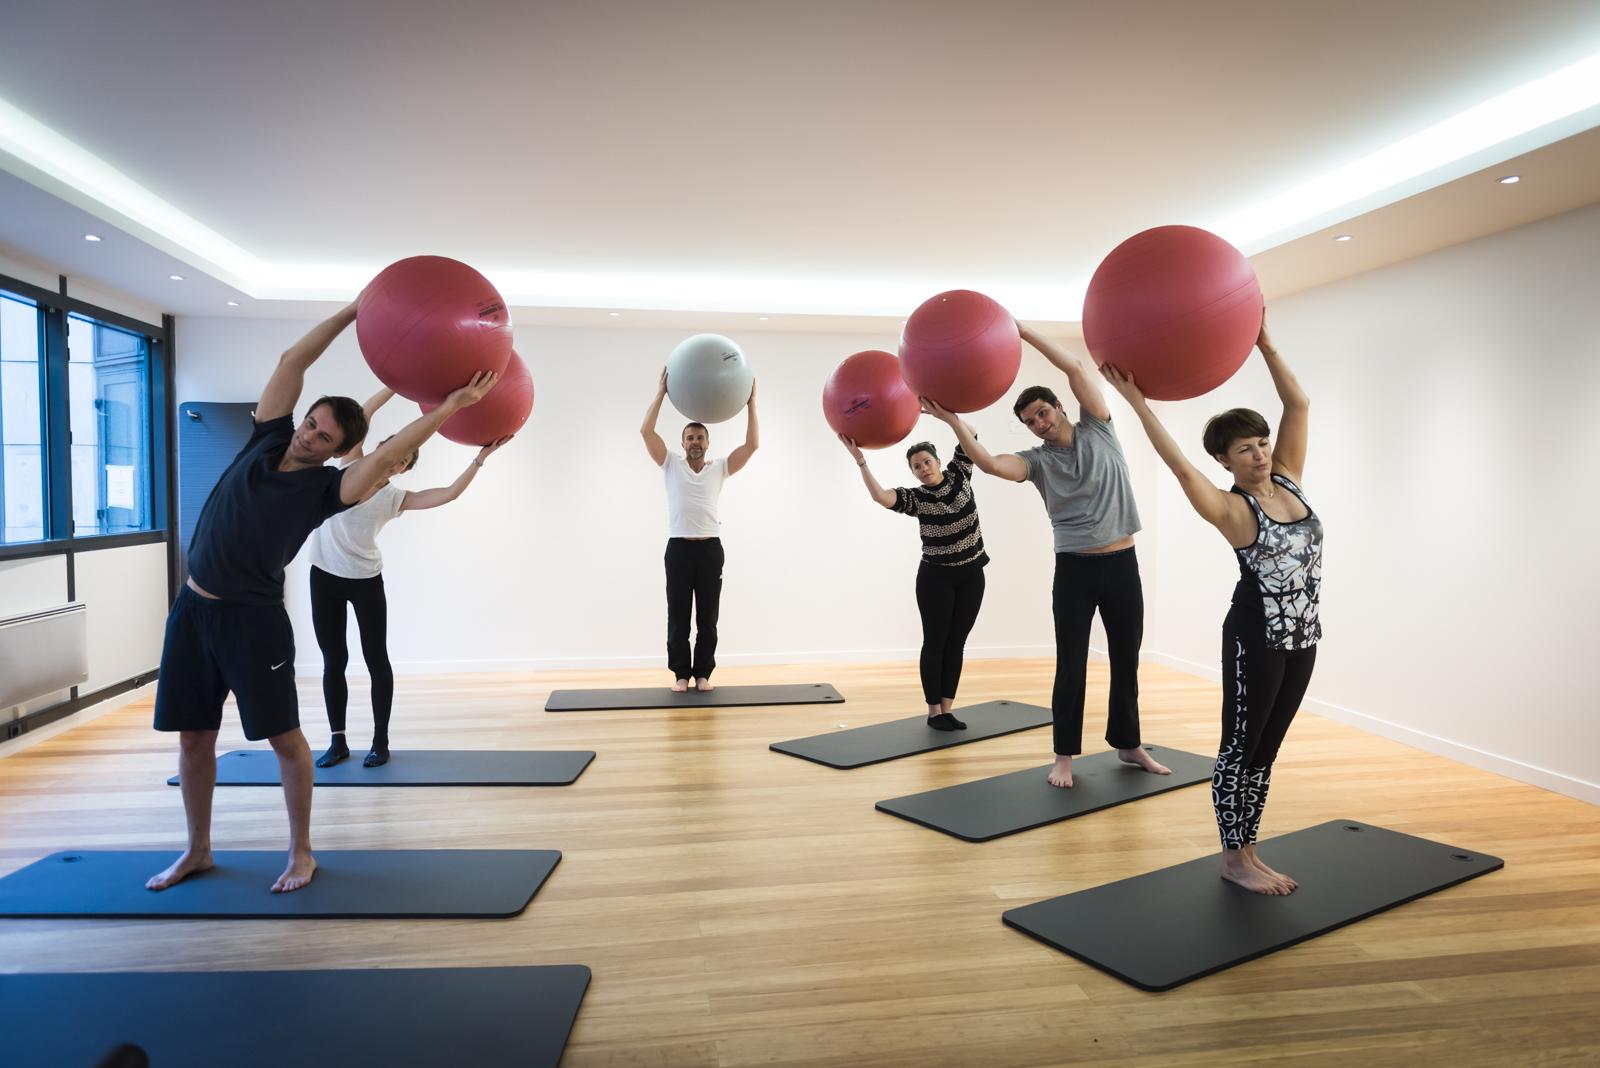 qee levallois yoga pilates. Black Bedroom Furniture Sets. Home Design Ideas